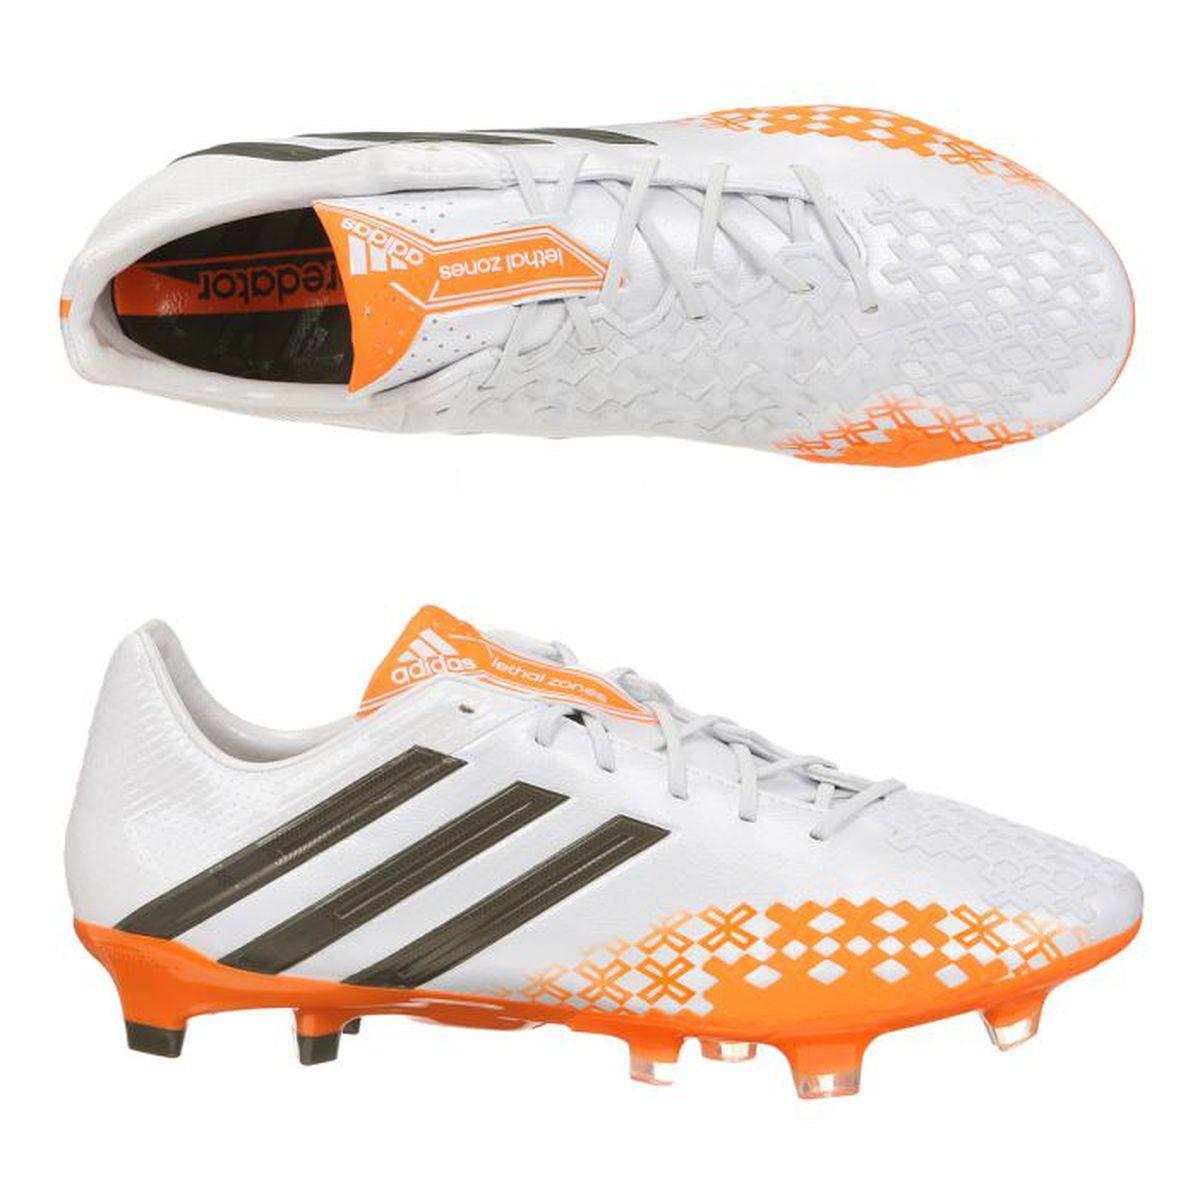 Pas Predator De Foot Homme Fg Prix Chaussures Adidas Cher Lz Trx jL45qARc3